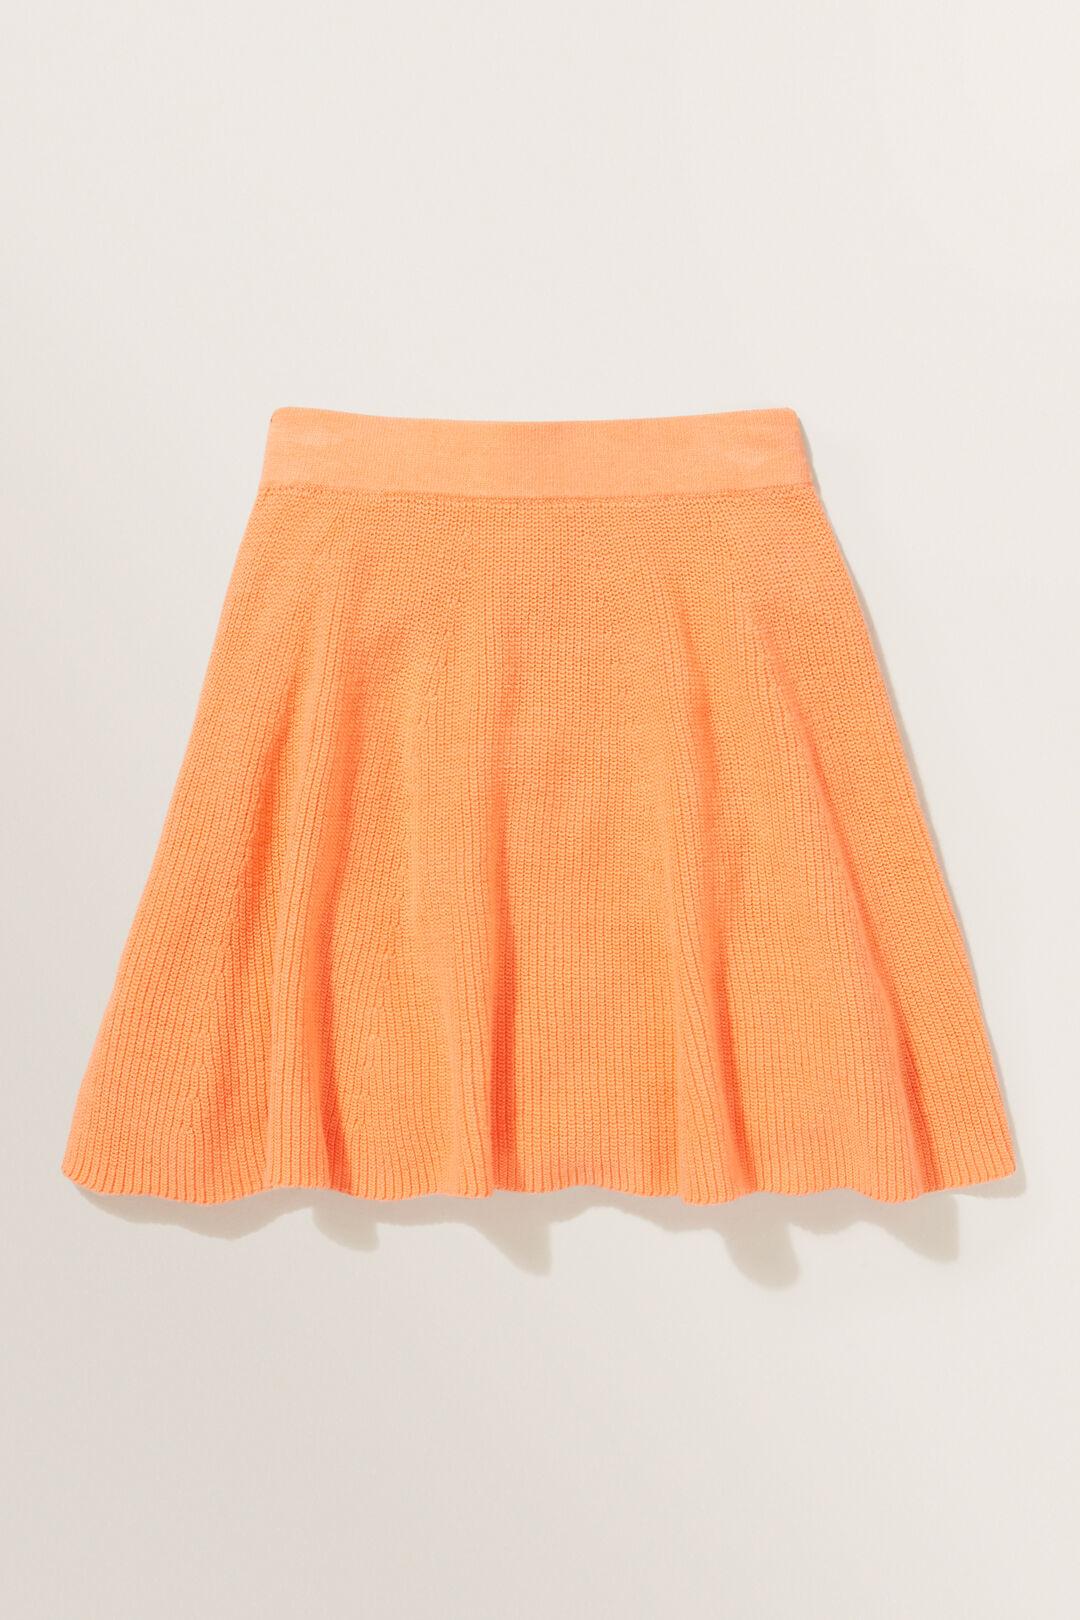 Knit Skirt  Apricot  hi-res